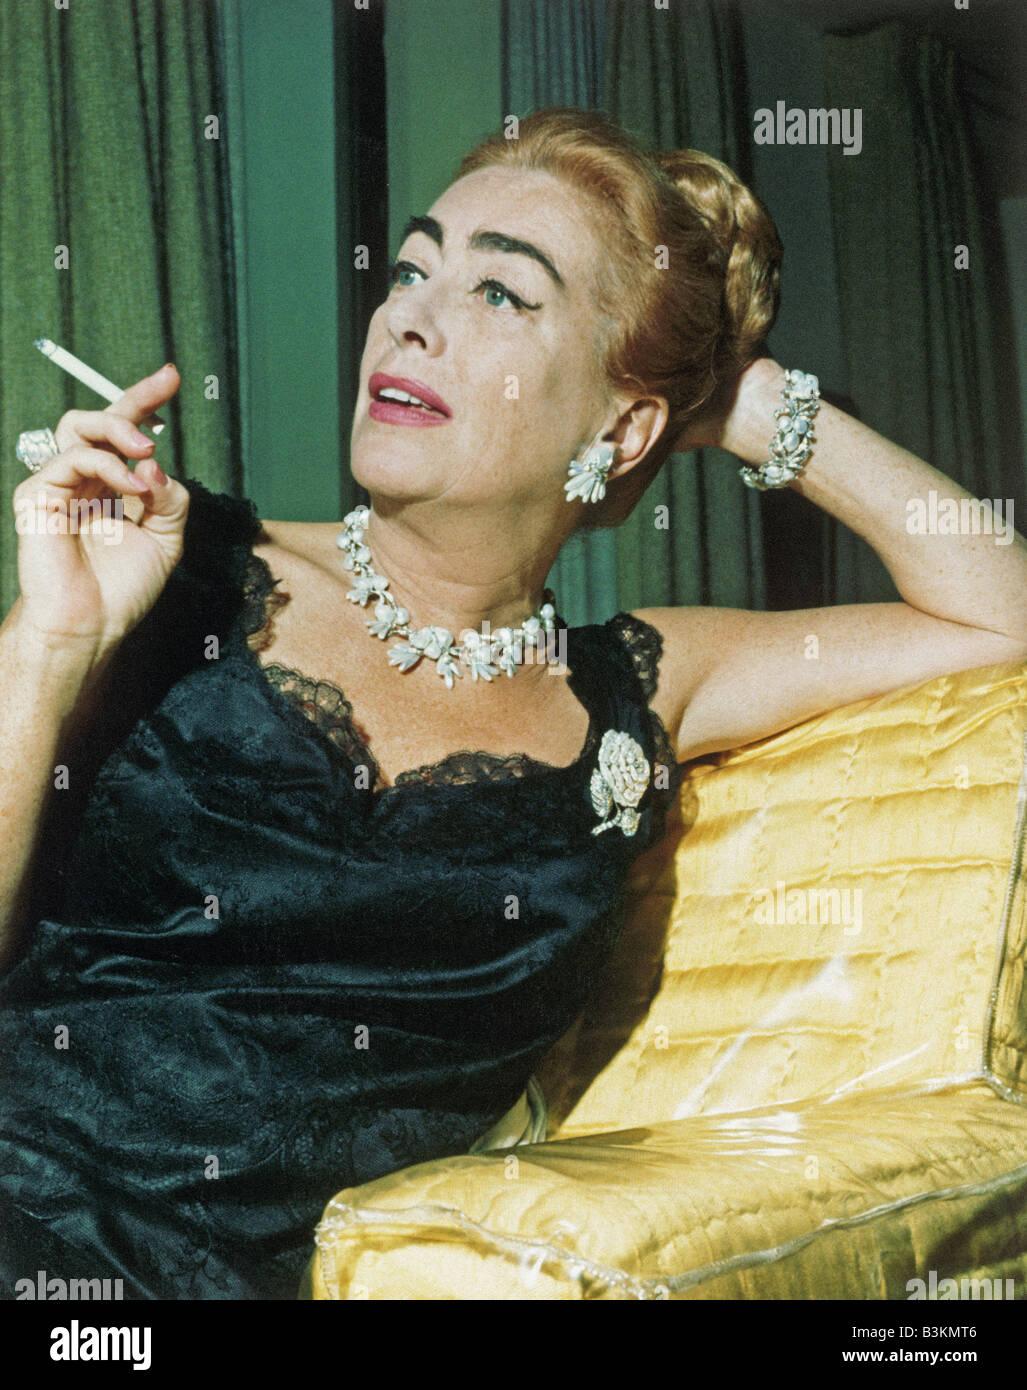 Joan Crawford Us Film Actress Stock Photo 19487782 Alamy